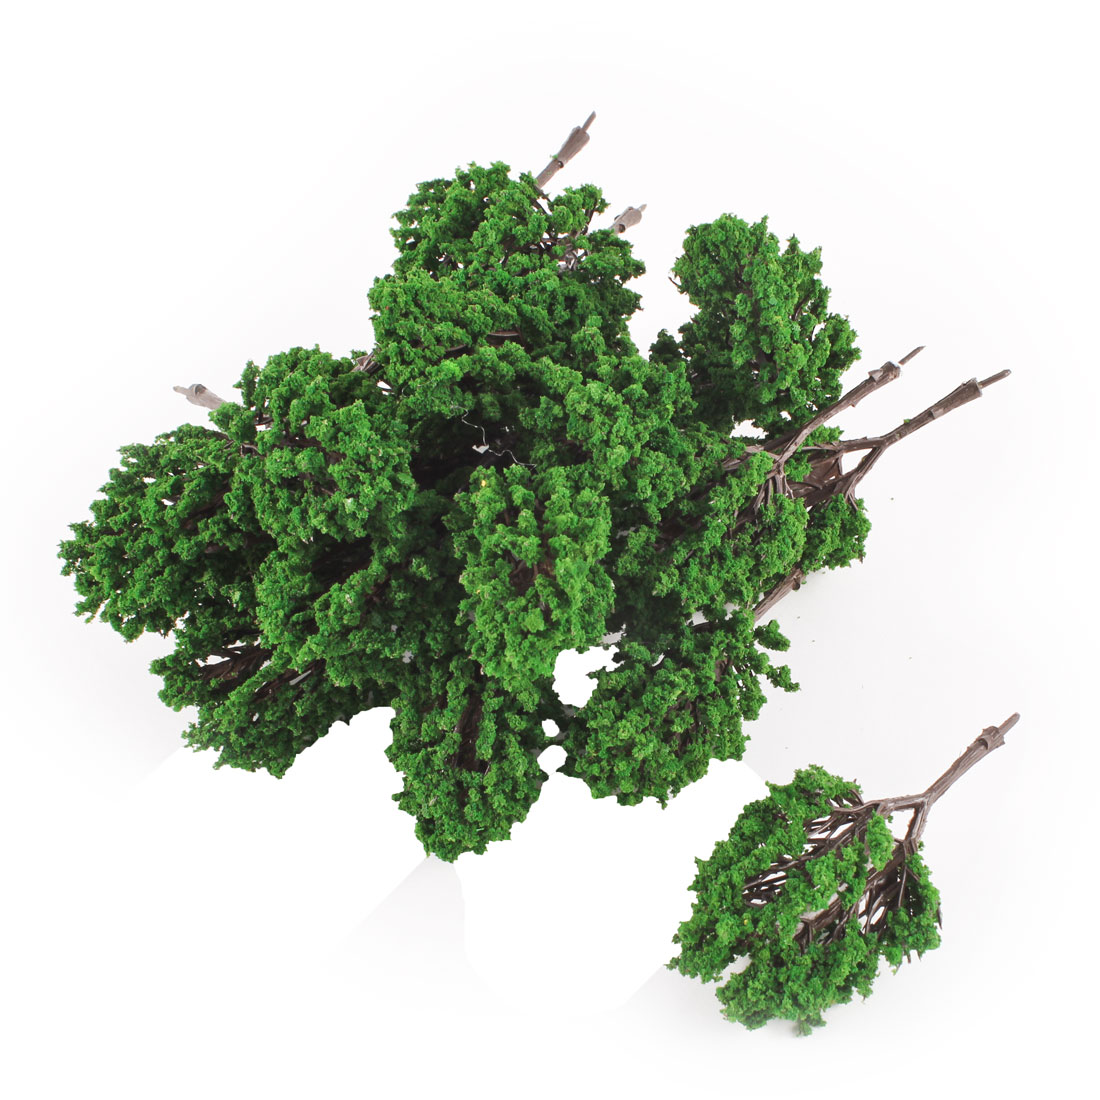 20pcs Green Plastic Model Trees Layout Scene 8cm High 1:150